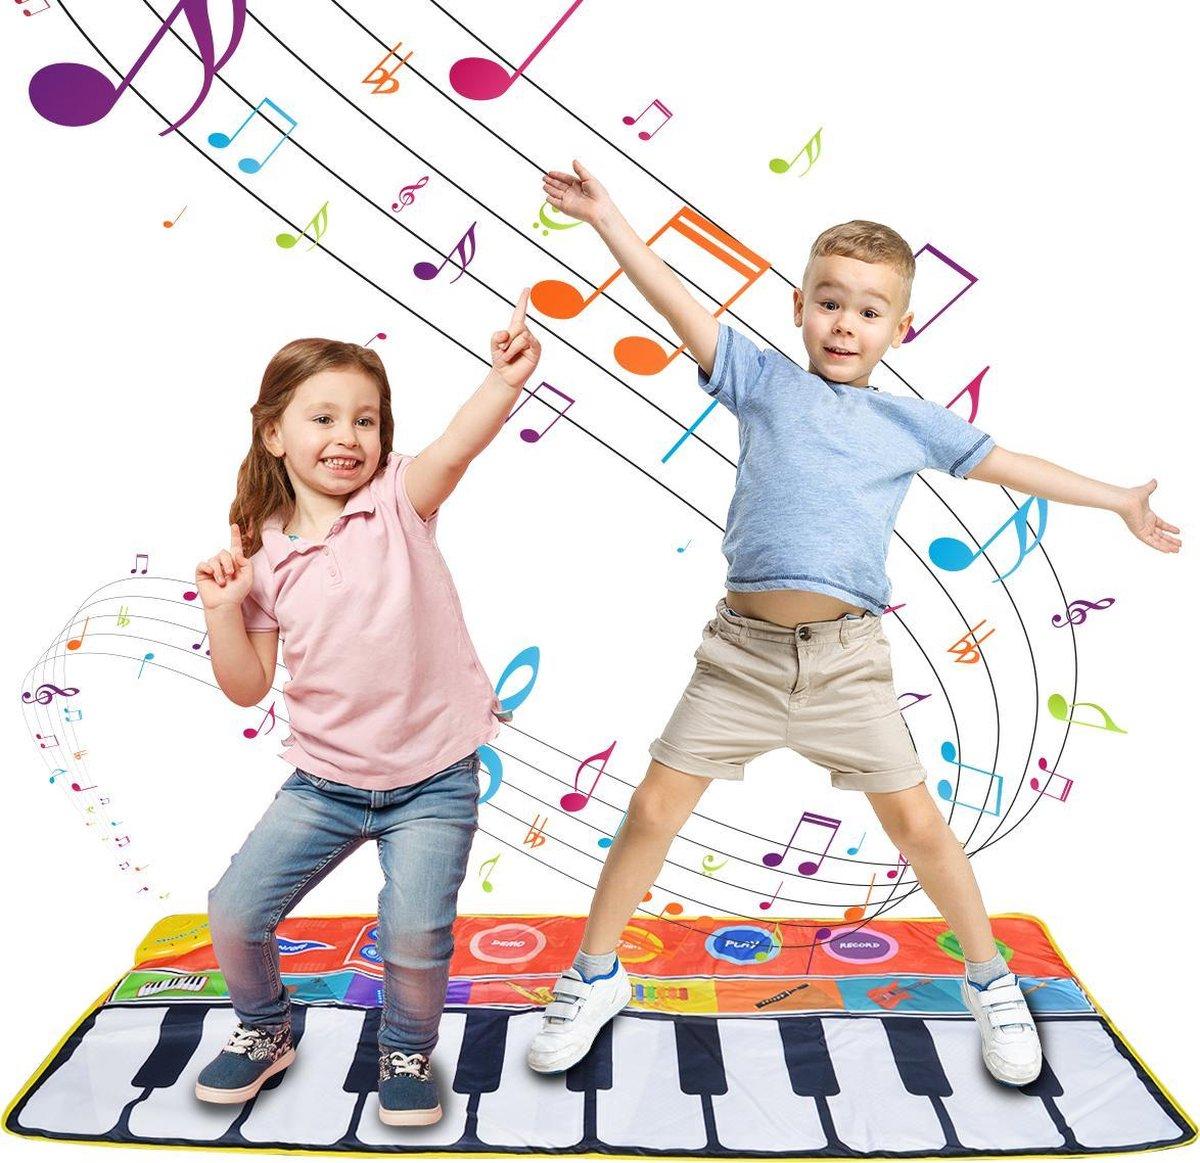 DePlay XL Piano Mat - Speelmat - Dansmat - Keyboard - Speelkleed Baby - Acht Instrumenten - Anti-sli